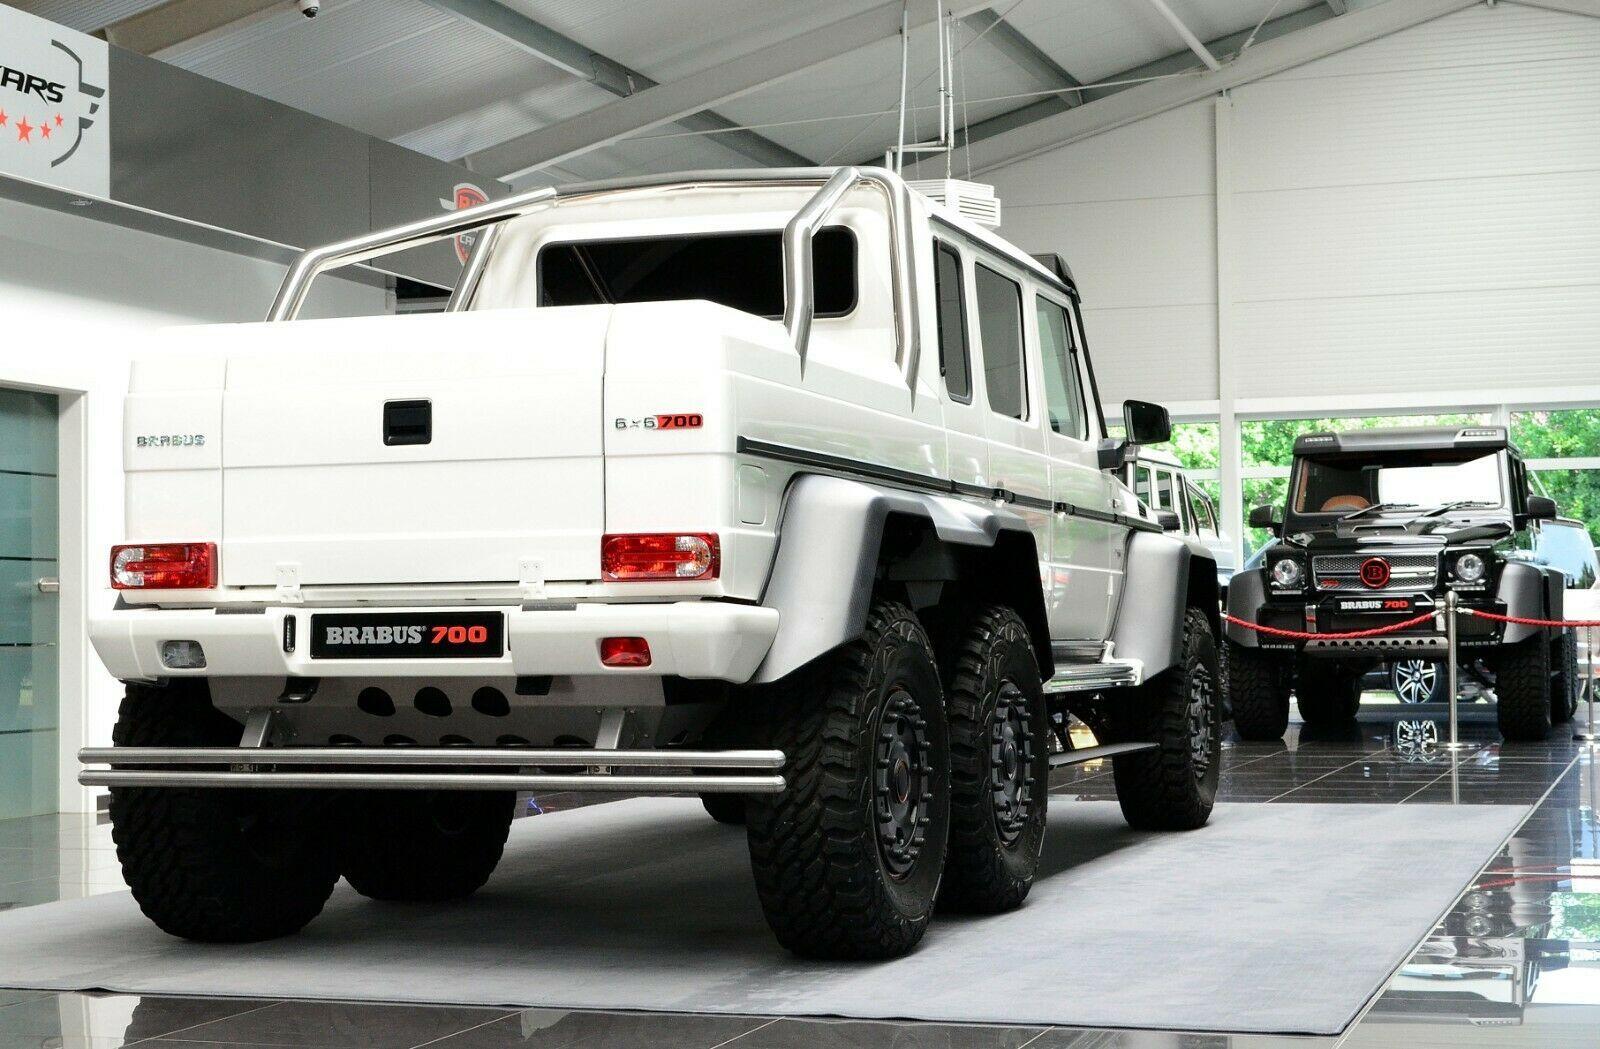 Mercedes Benz G 63 Amg 6x6 Brabus700 Luxury Pulse Cars Germany